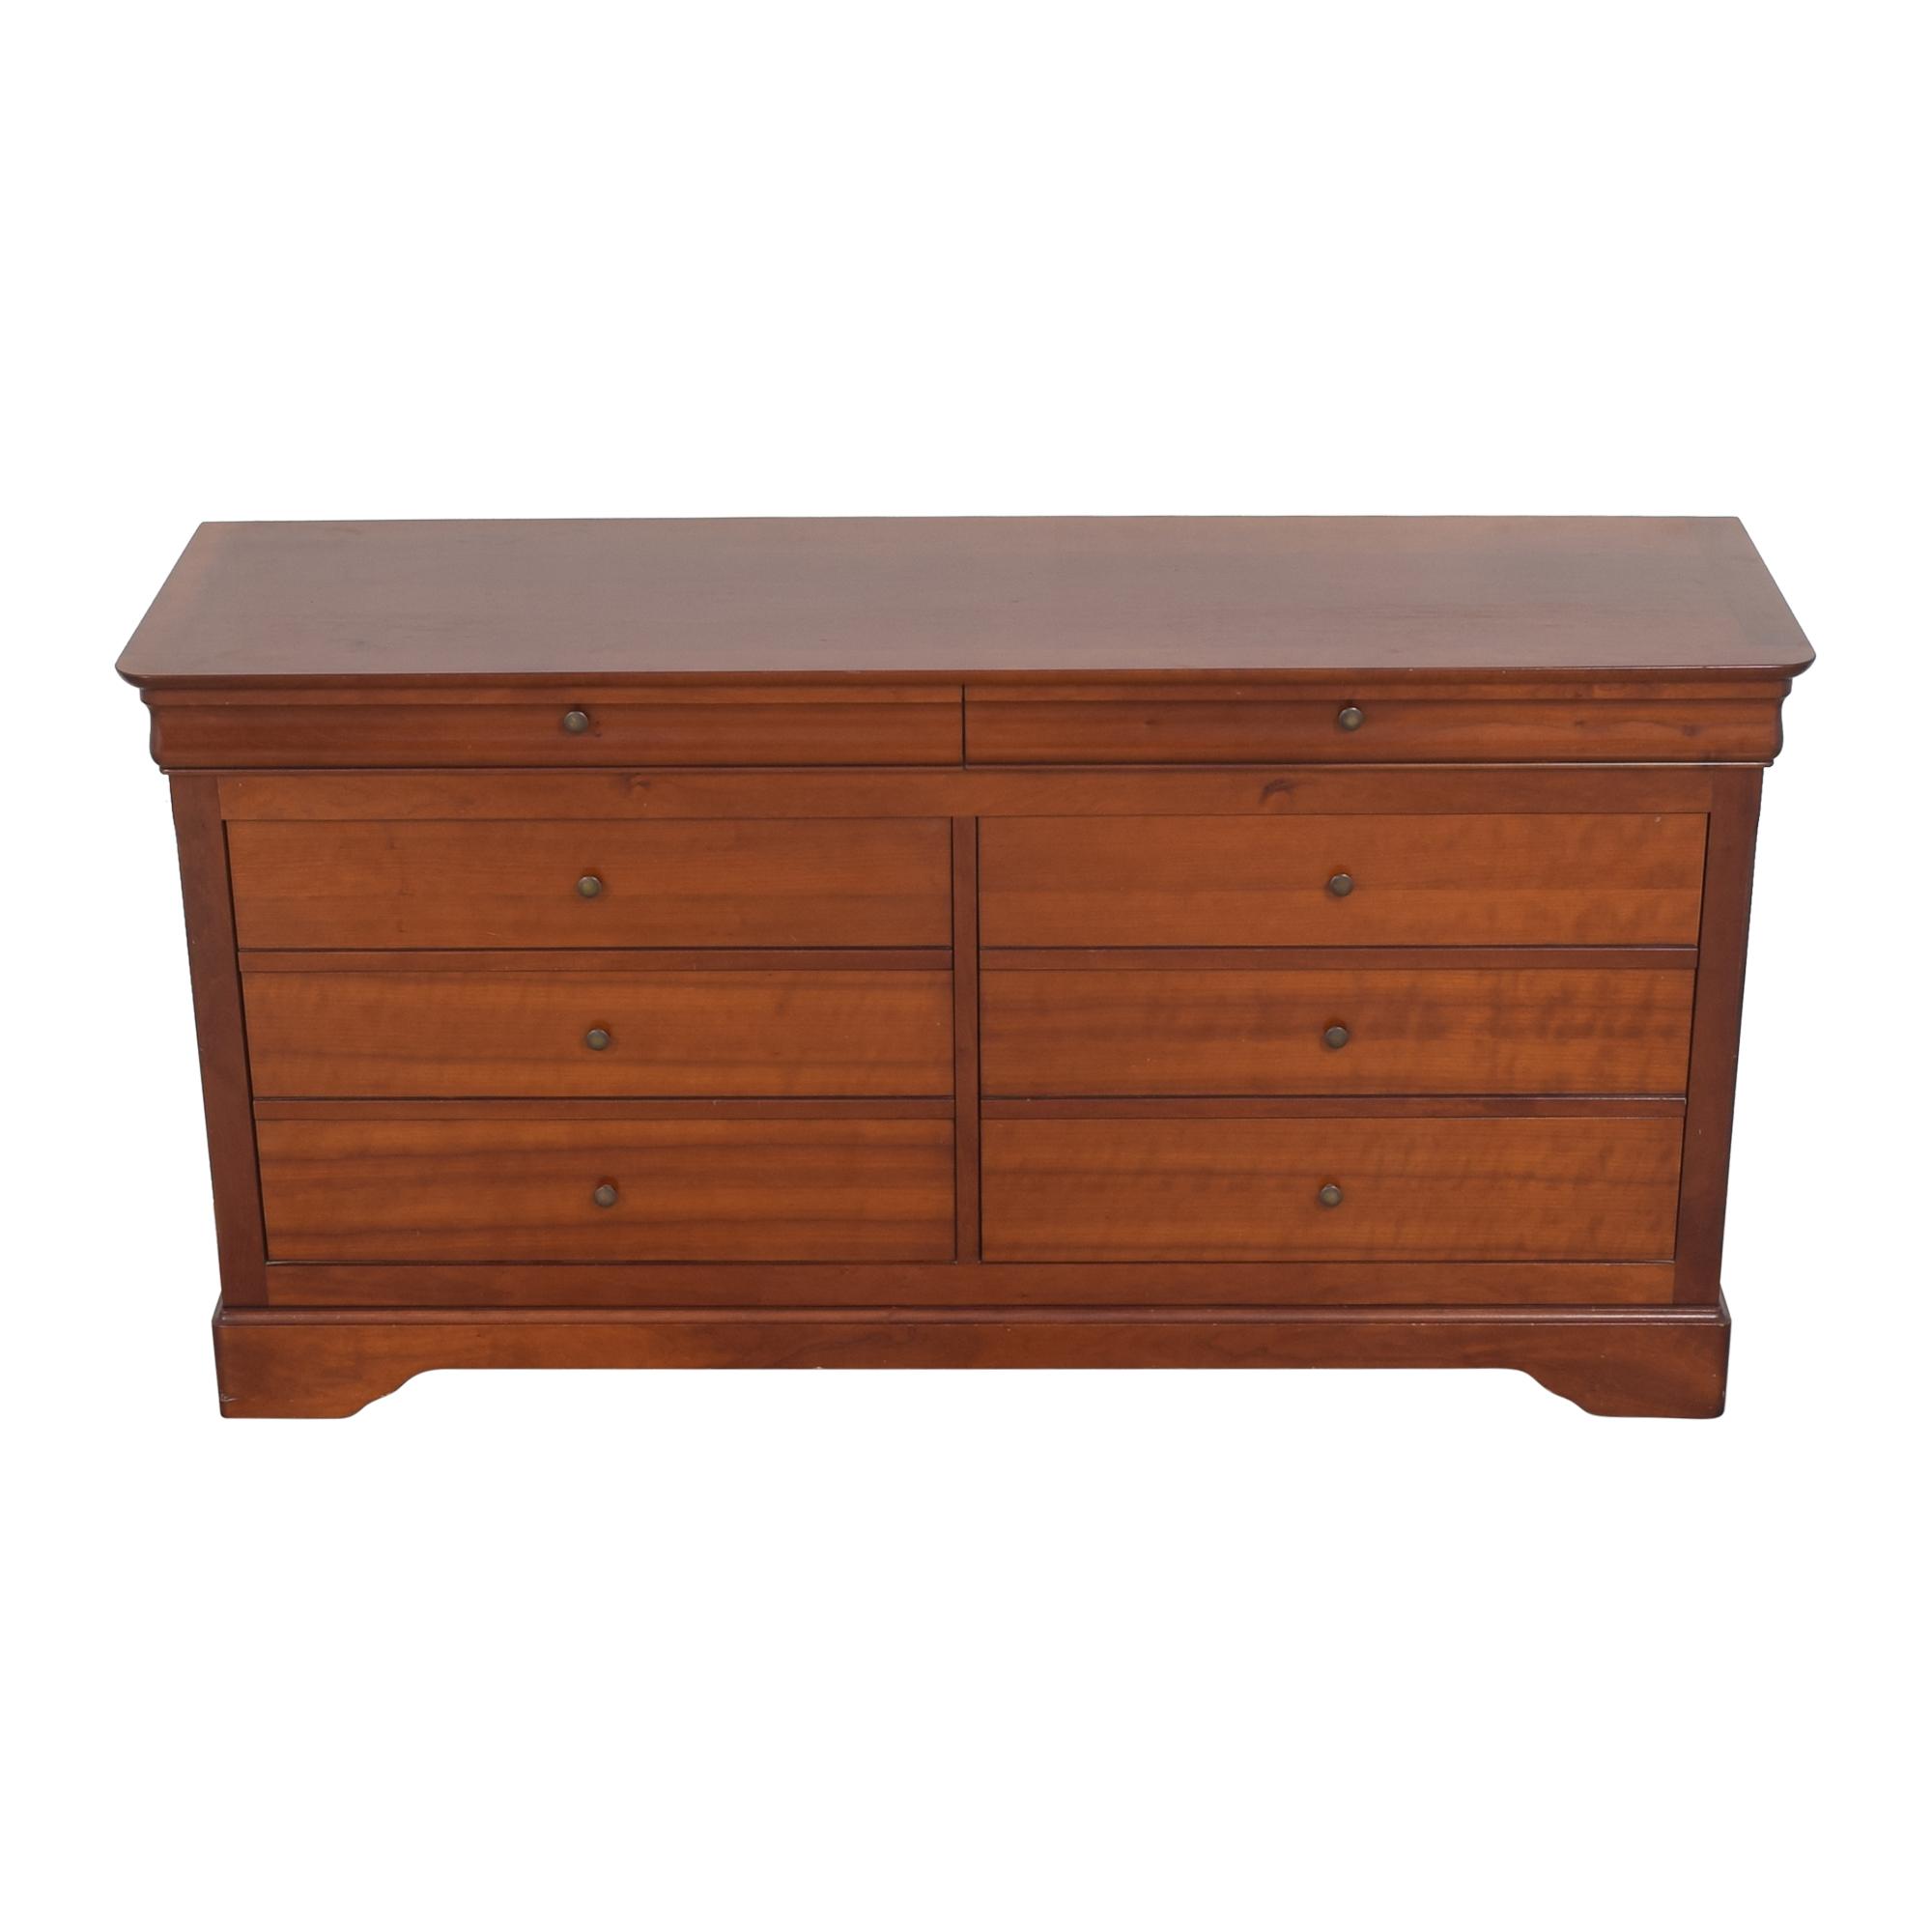 Grange Grange Double Dresser second hand